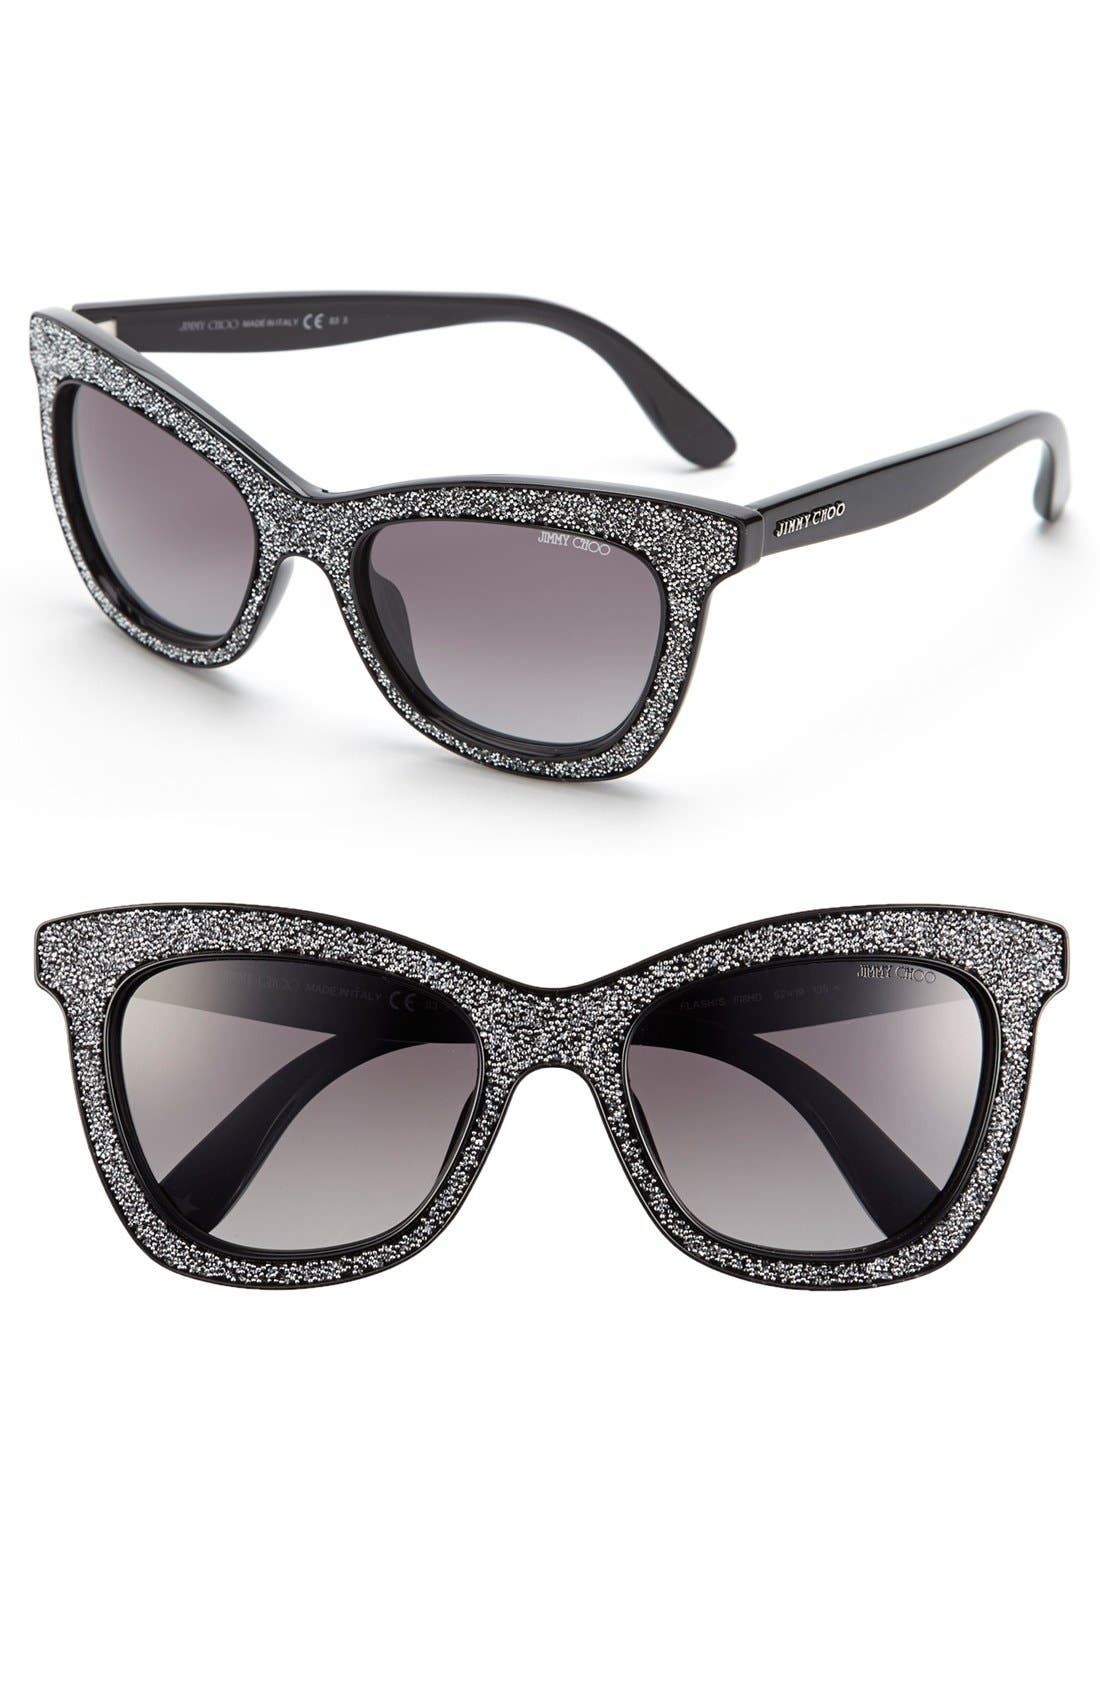 Alternate Image 1 Selected - Jimmy Choo 'Flash' 52mm Sunglasses